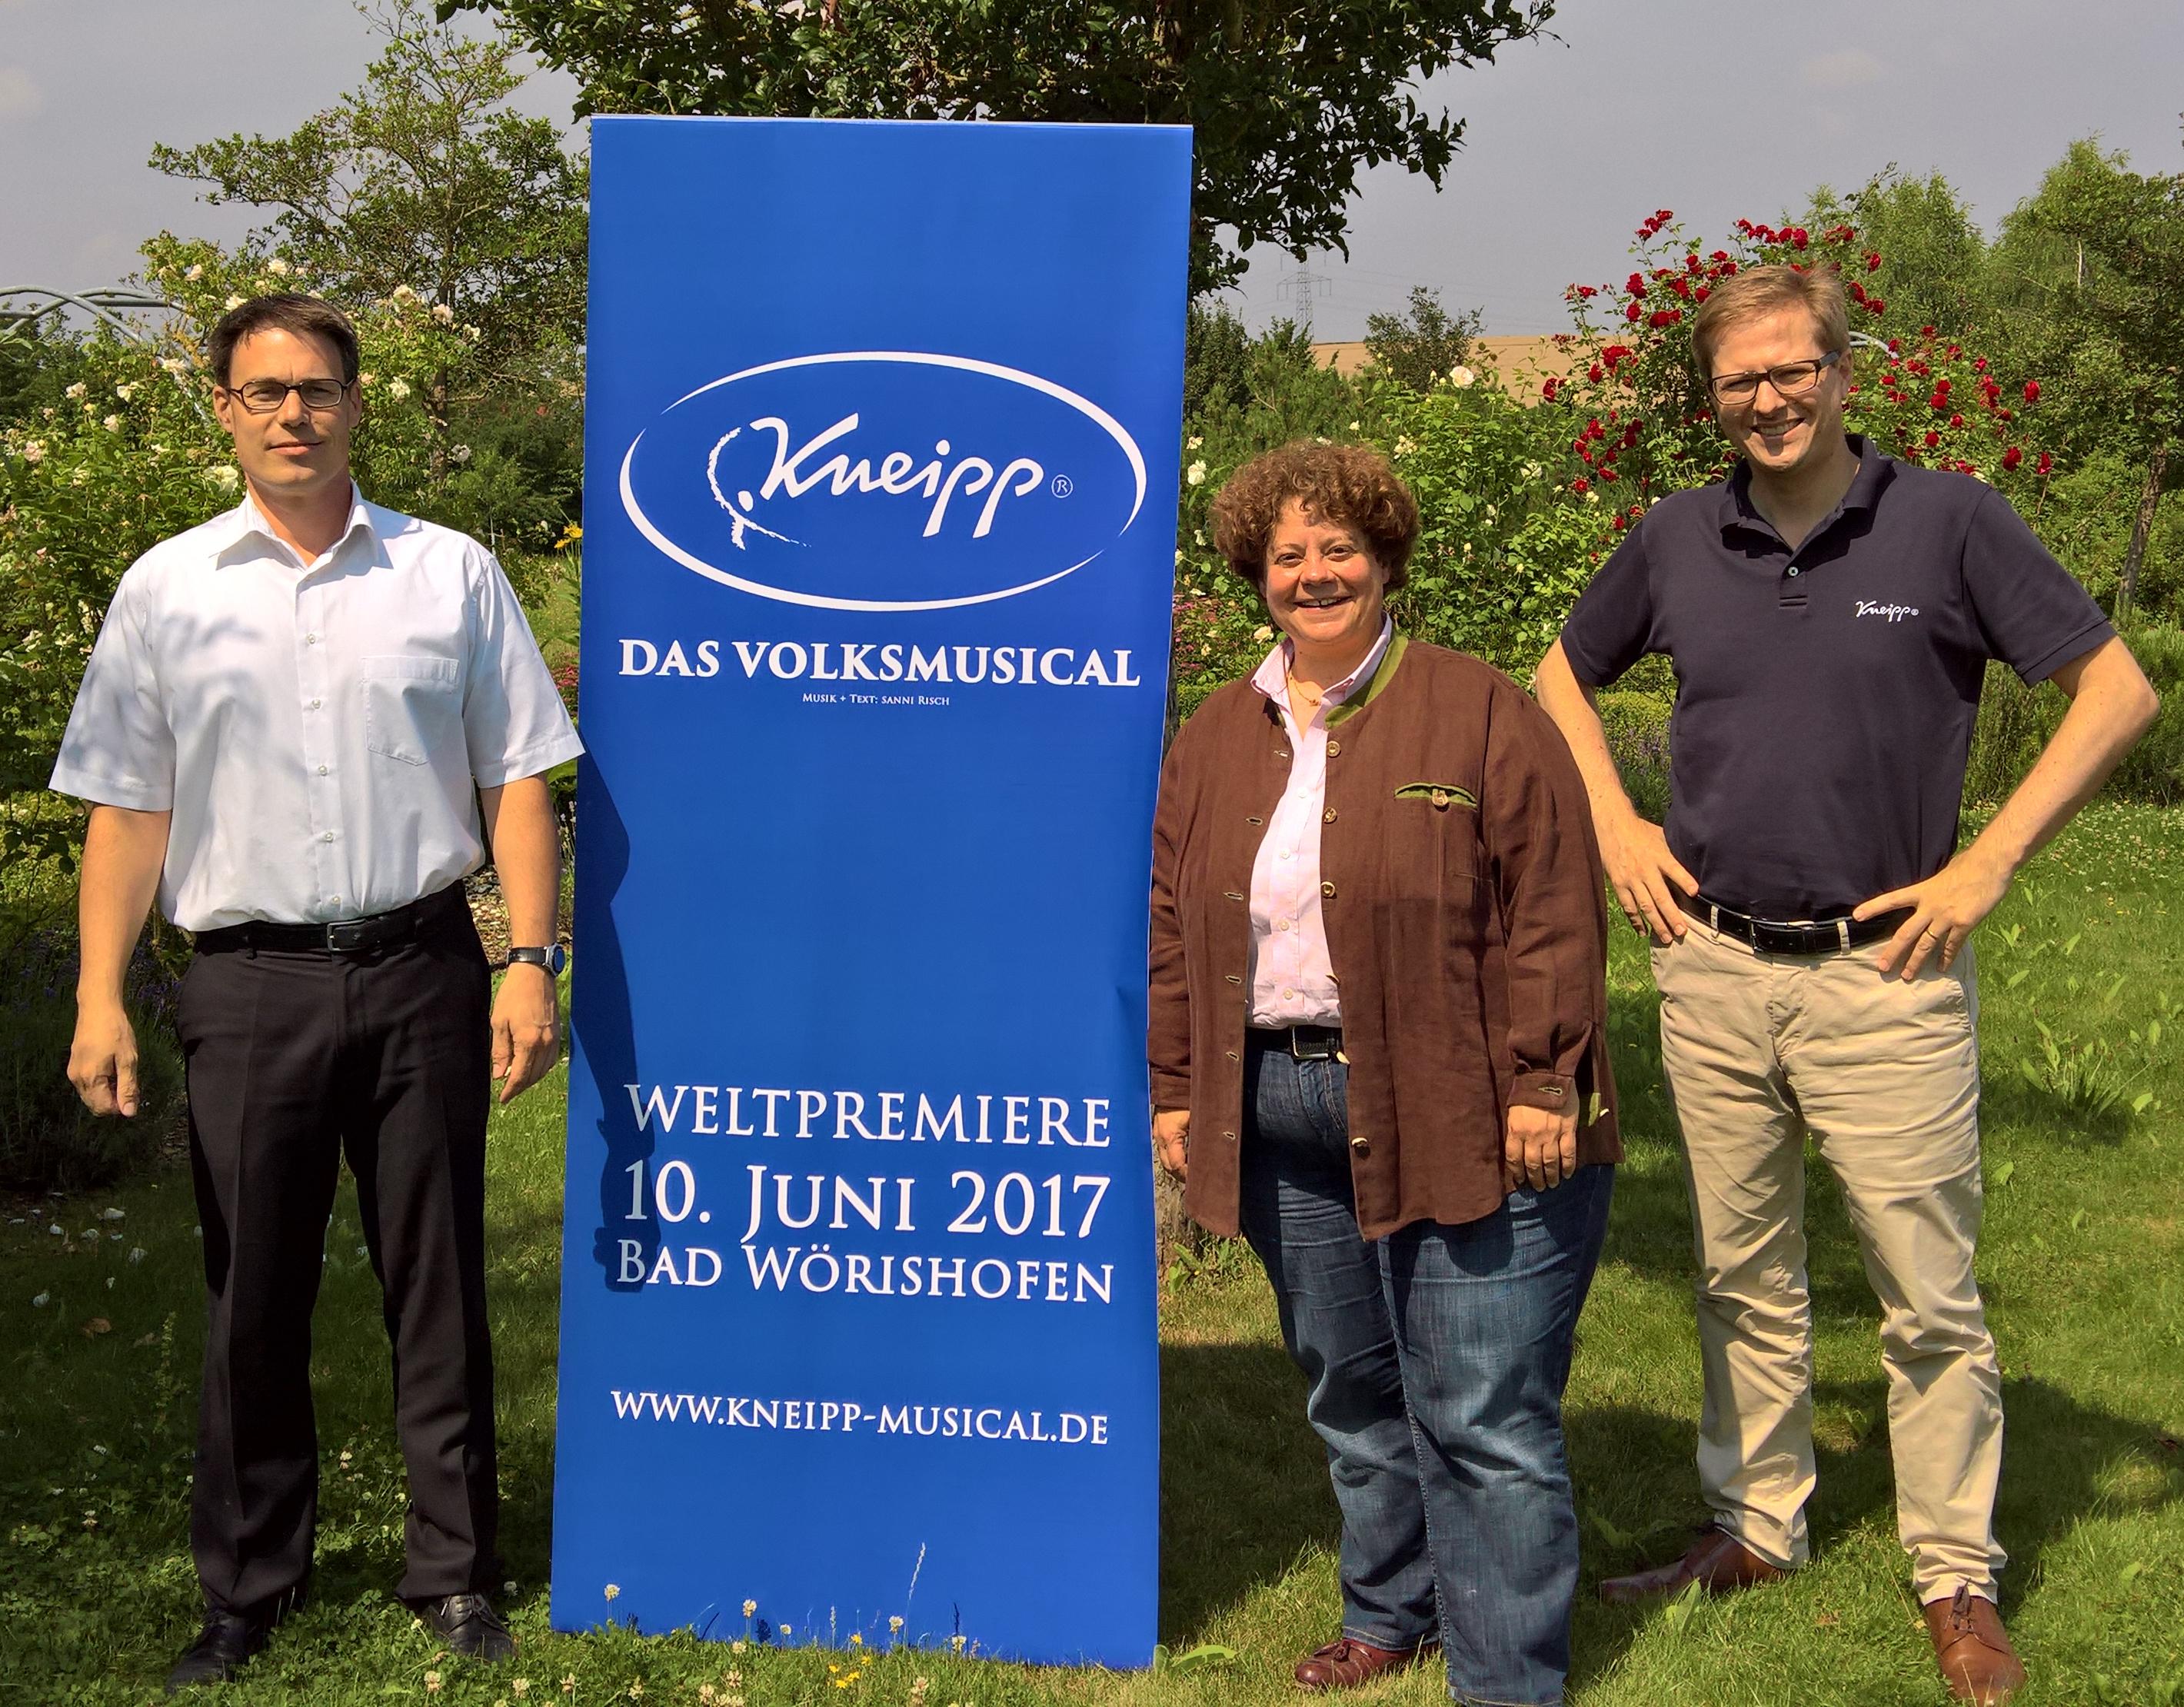 KNEIPP GmbH Würzburg offizieller Partner / Offizielles Logo vorgestellt